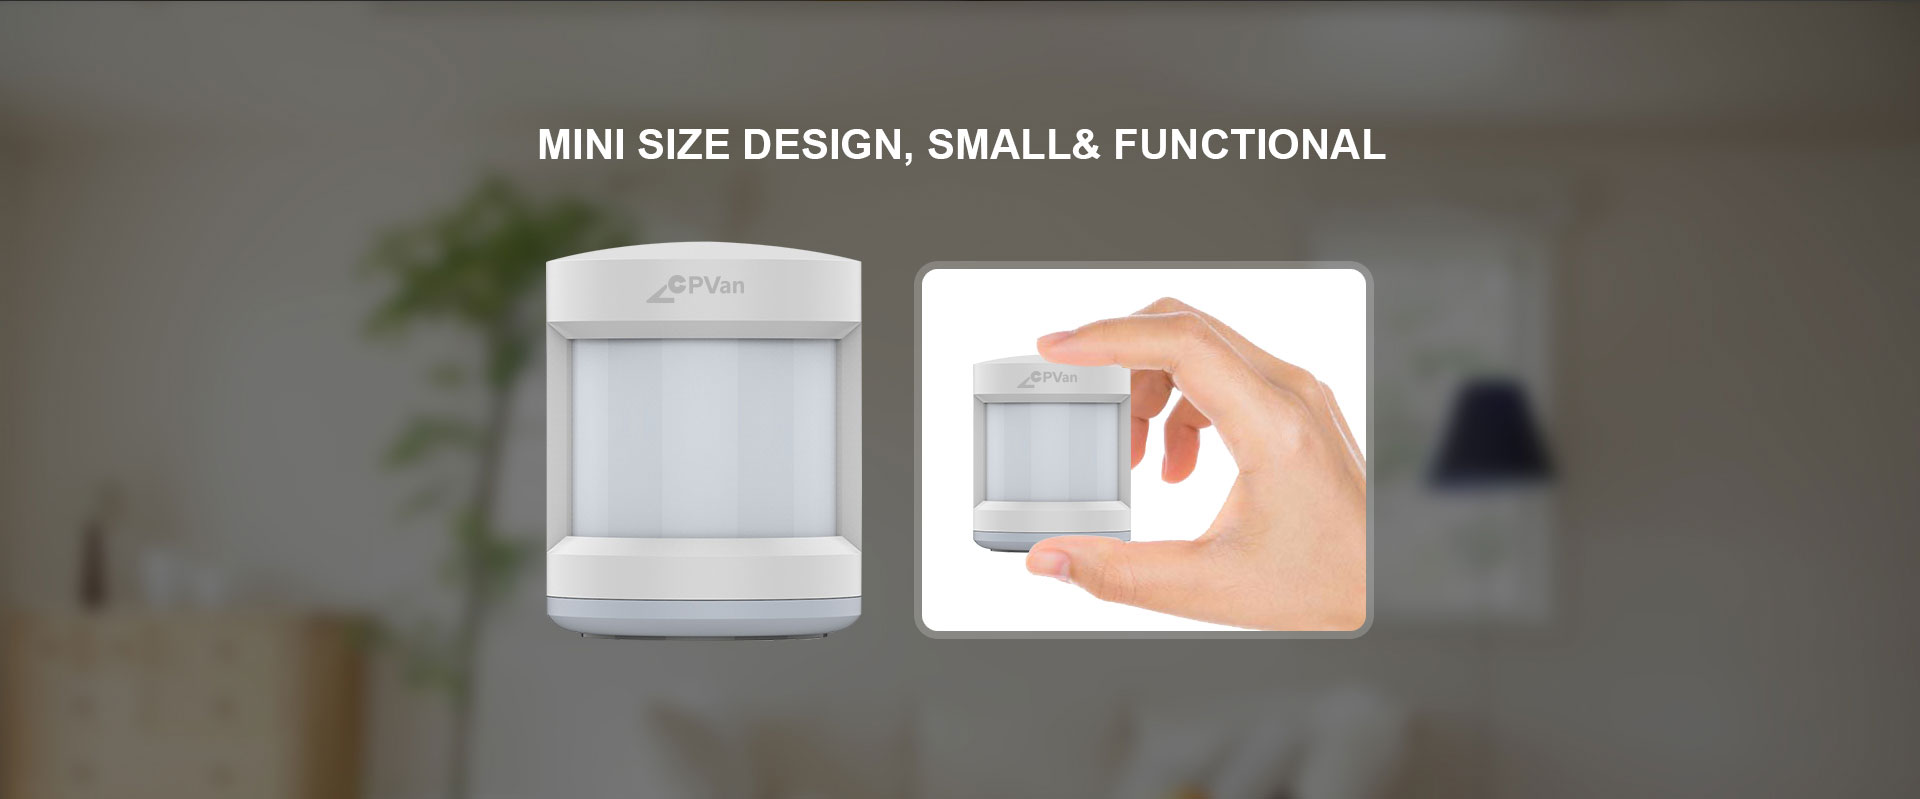 Zigbee Motion PIR Sensor